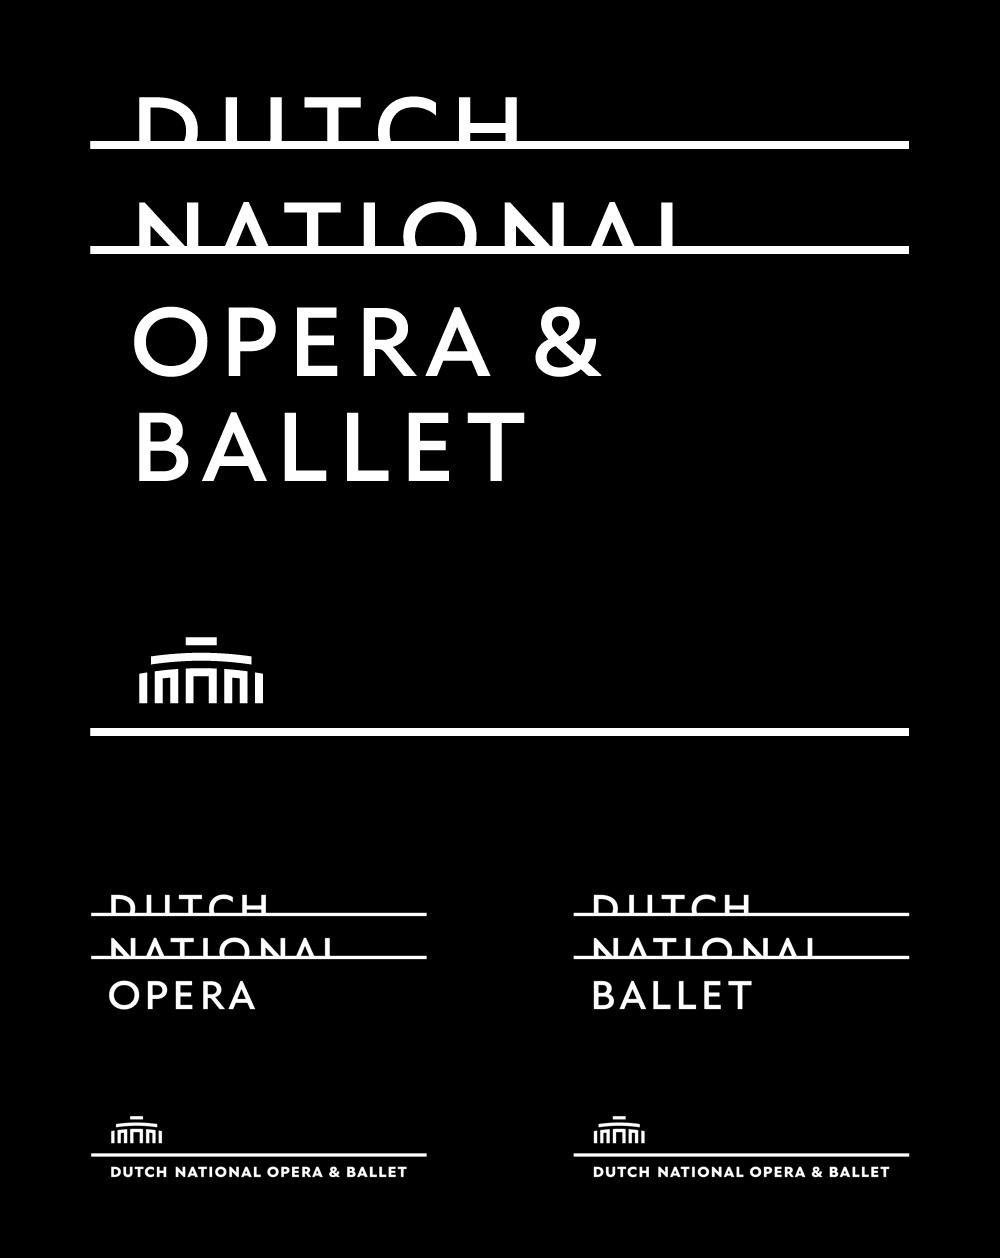 dutch_national_opera_and_ballet_logo